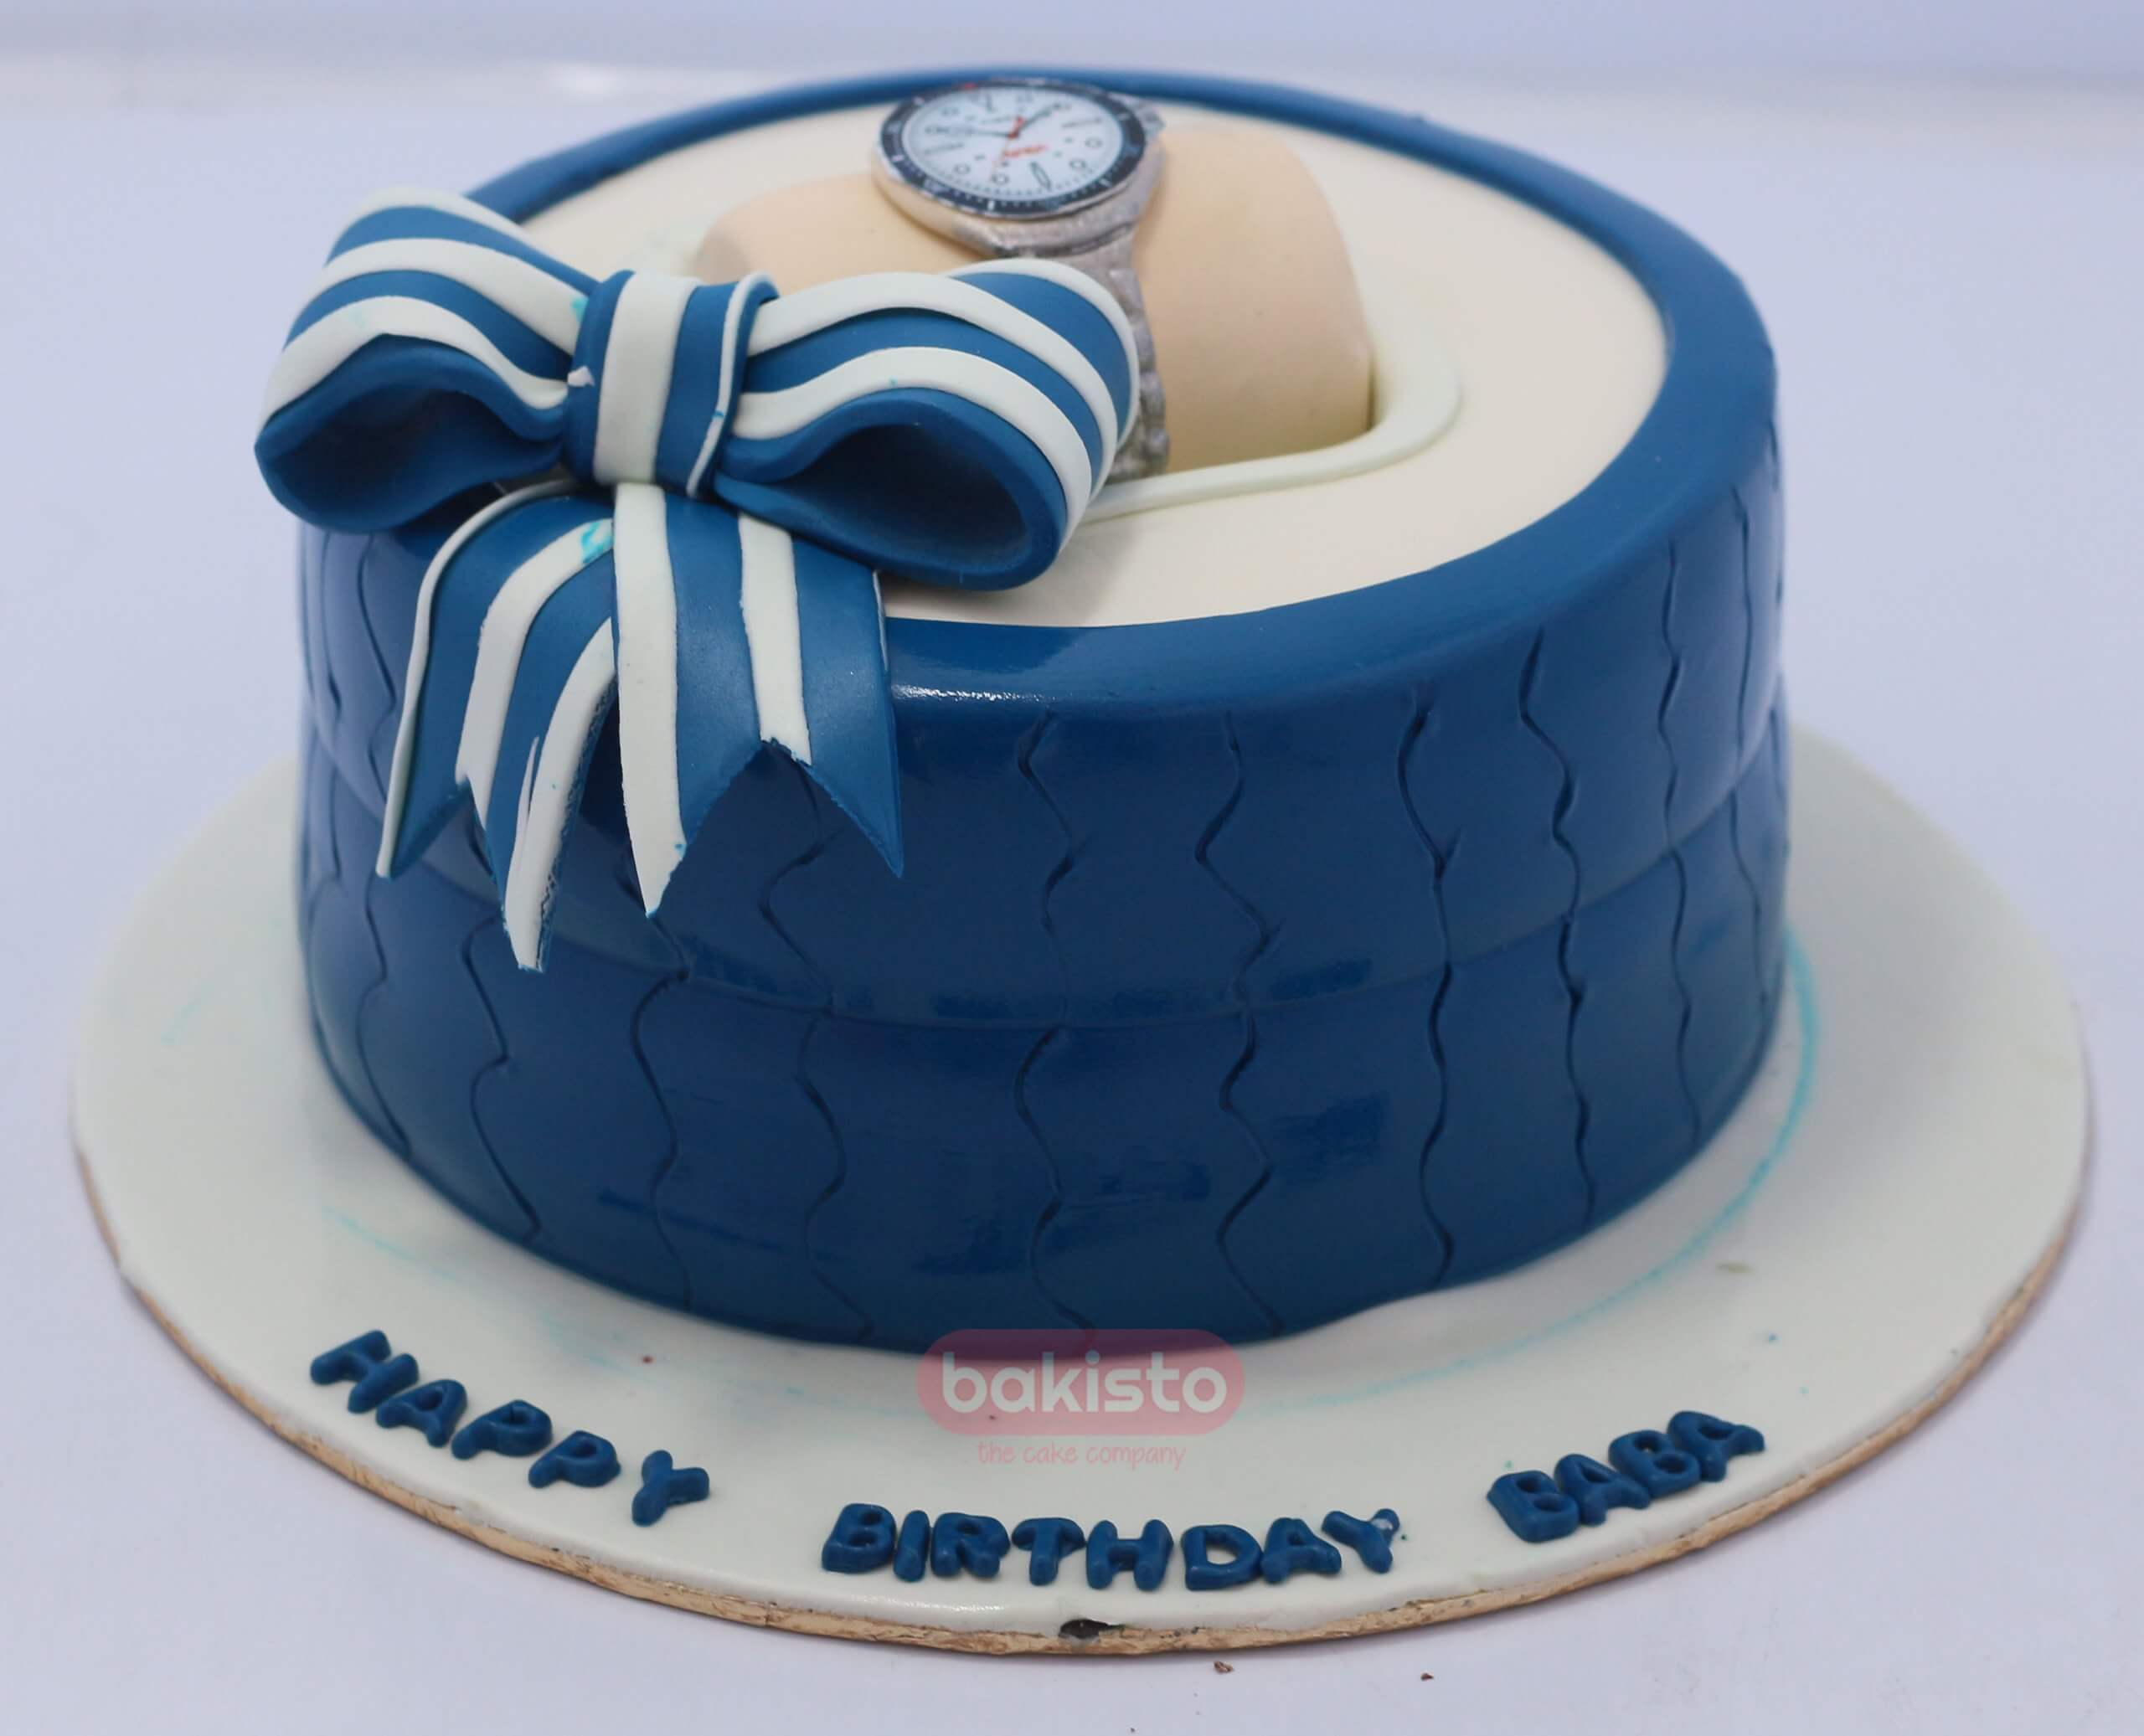 Pleasing Customized Dad Birthday Theme Cake By Bakisto The Cake Company Funny Birthday Cards Online Bapapcheapnameinfo